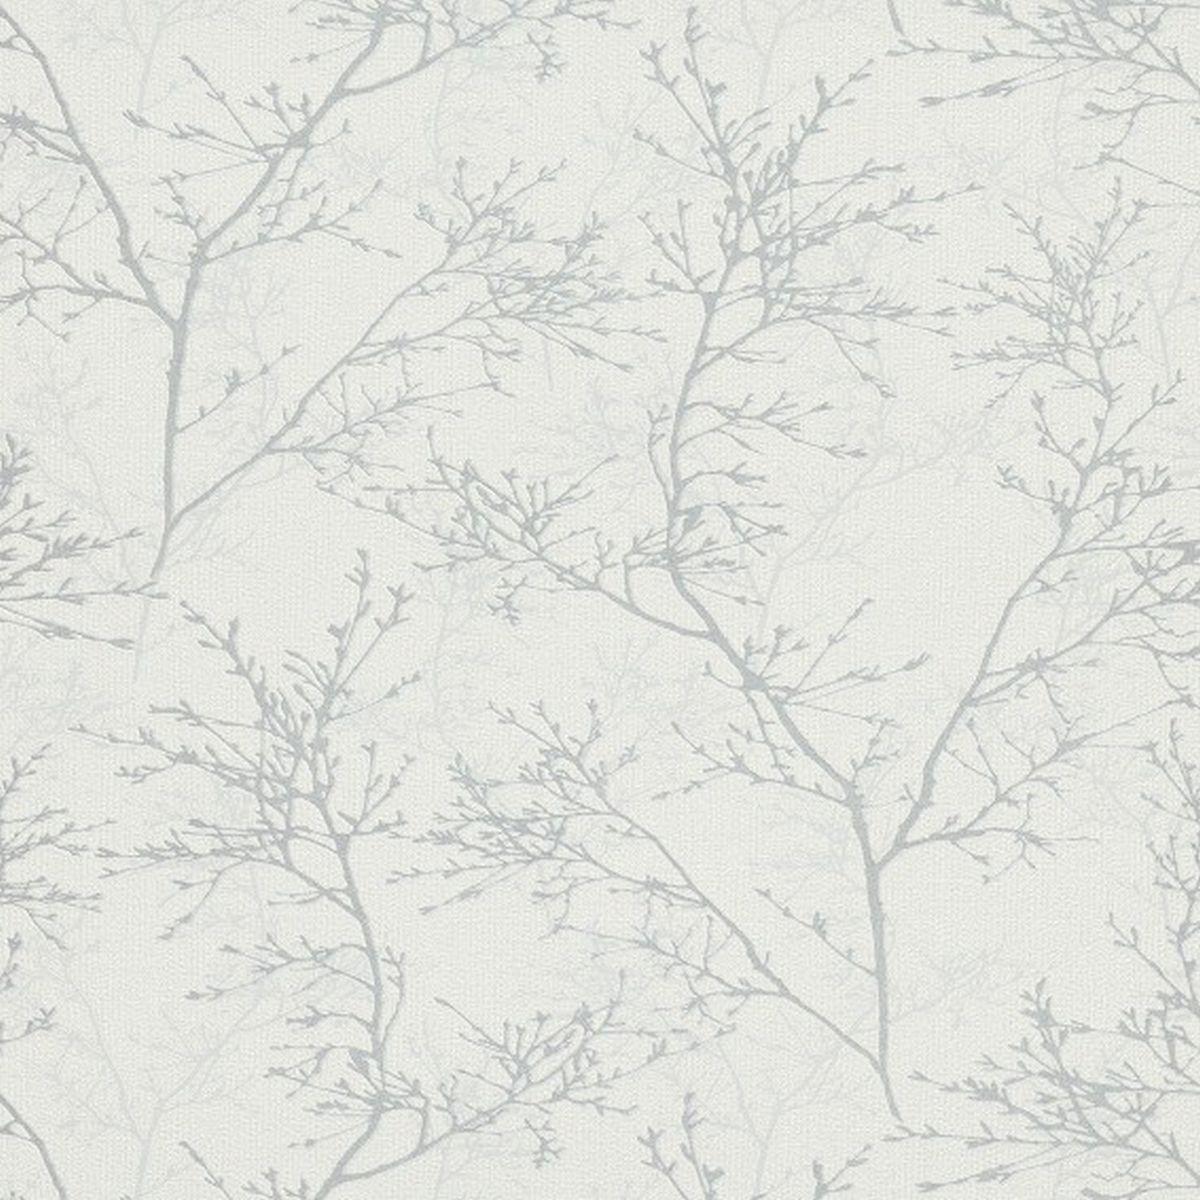 Erismann Vliestapete Kollektion Instawalls 543231 Blumen